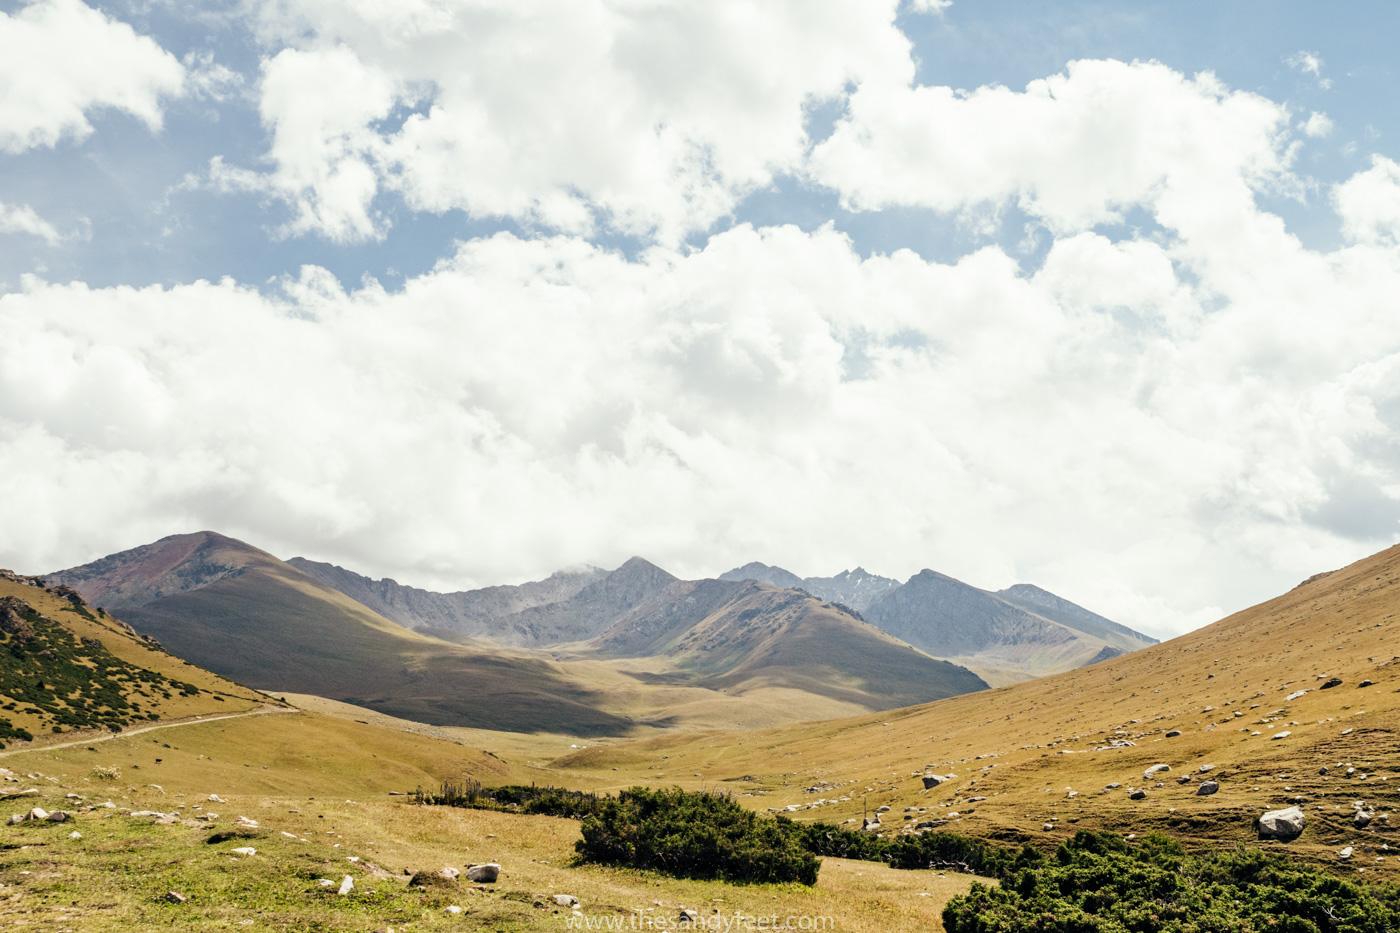 Hiking in Jyrgalan | Getting Off The Beaten Path In Kyrgyzstan